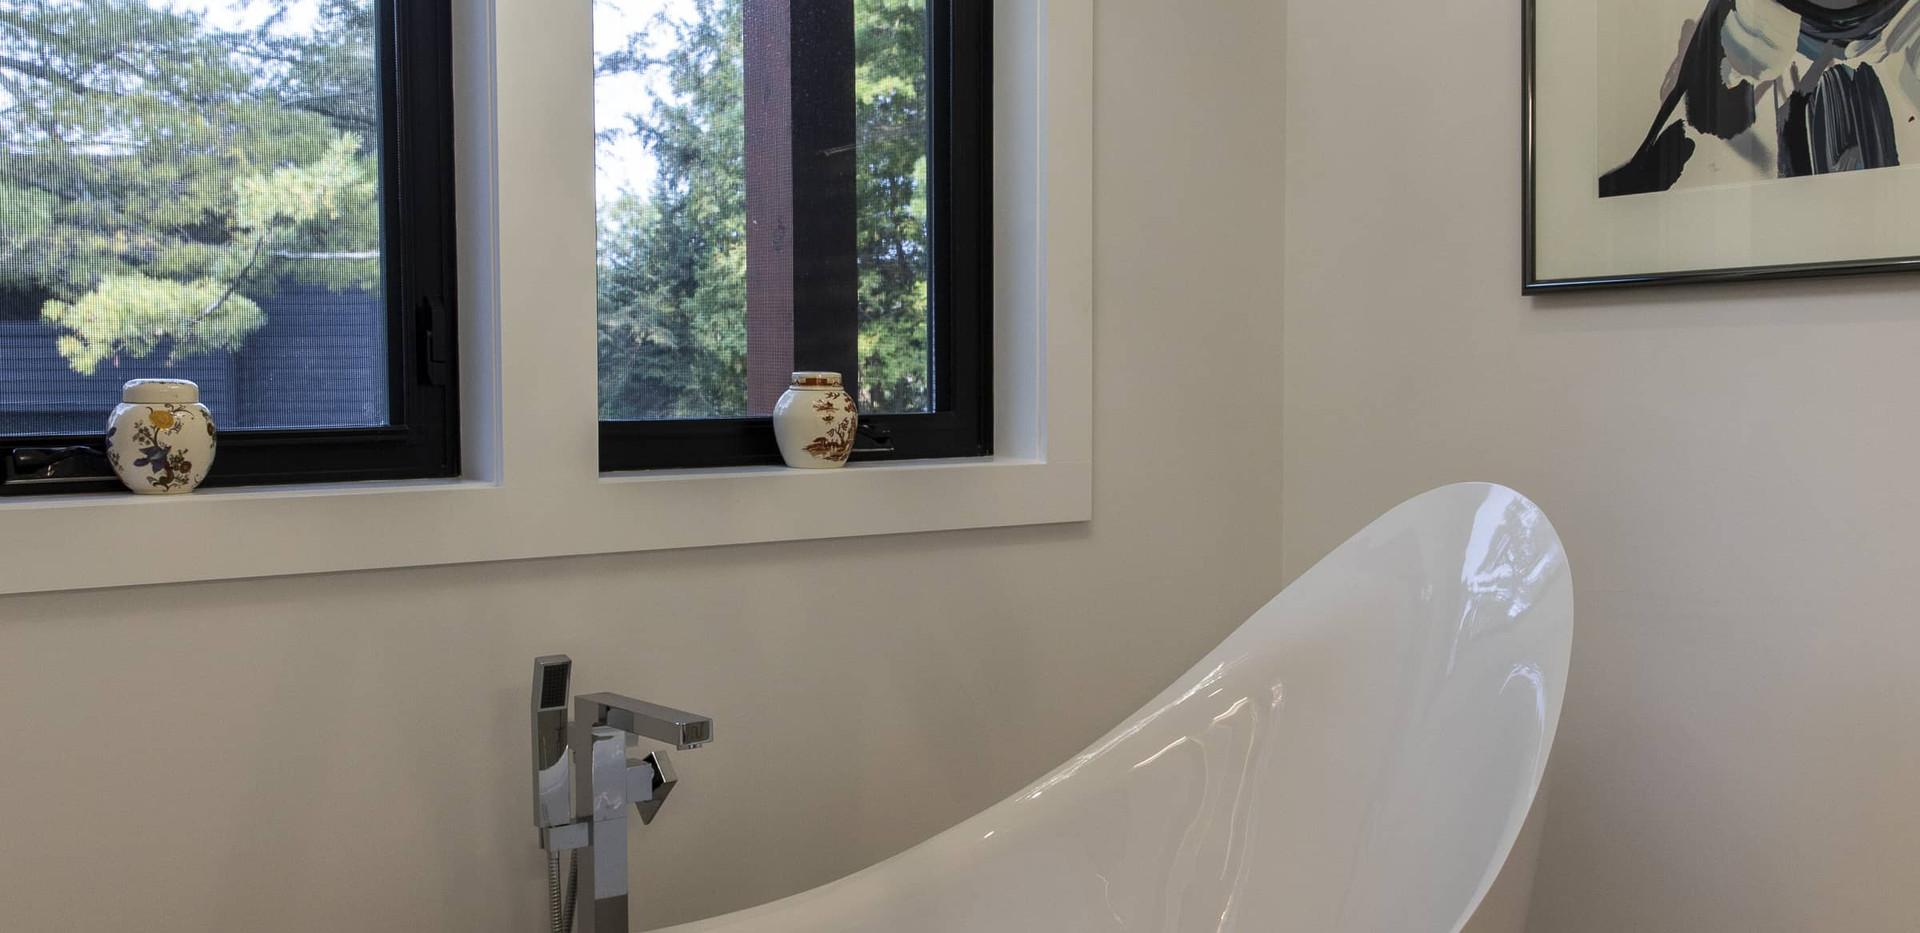 Large Freestanding Soaking Tub in Modern Bathroom Edenlane Muskoka